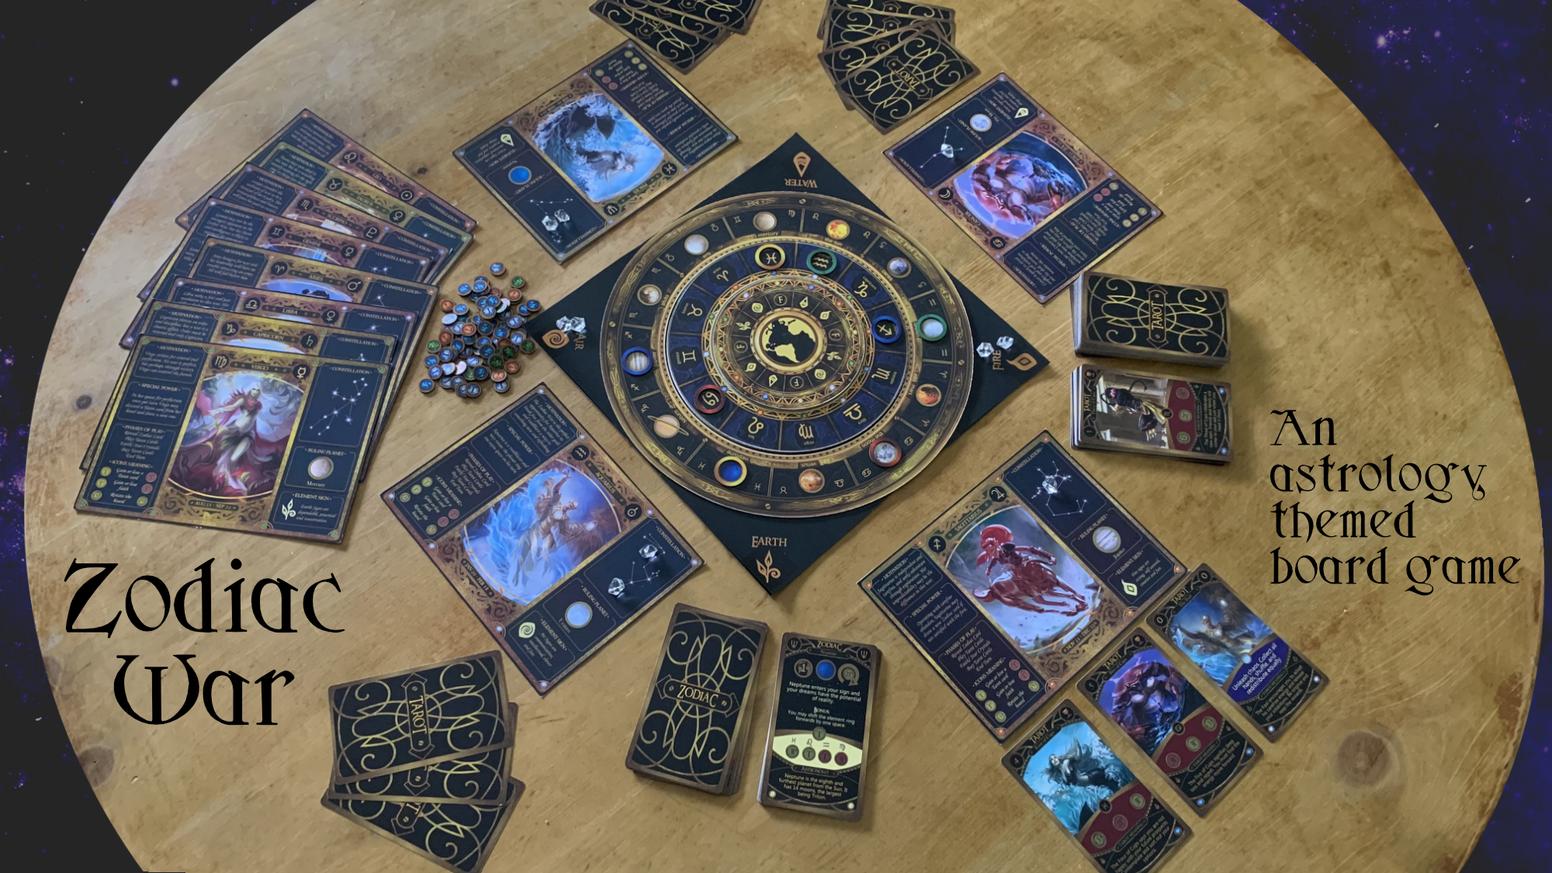 Zodiac War - An Astrology and Tarot Themed Board Game